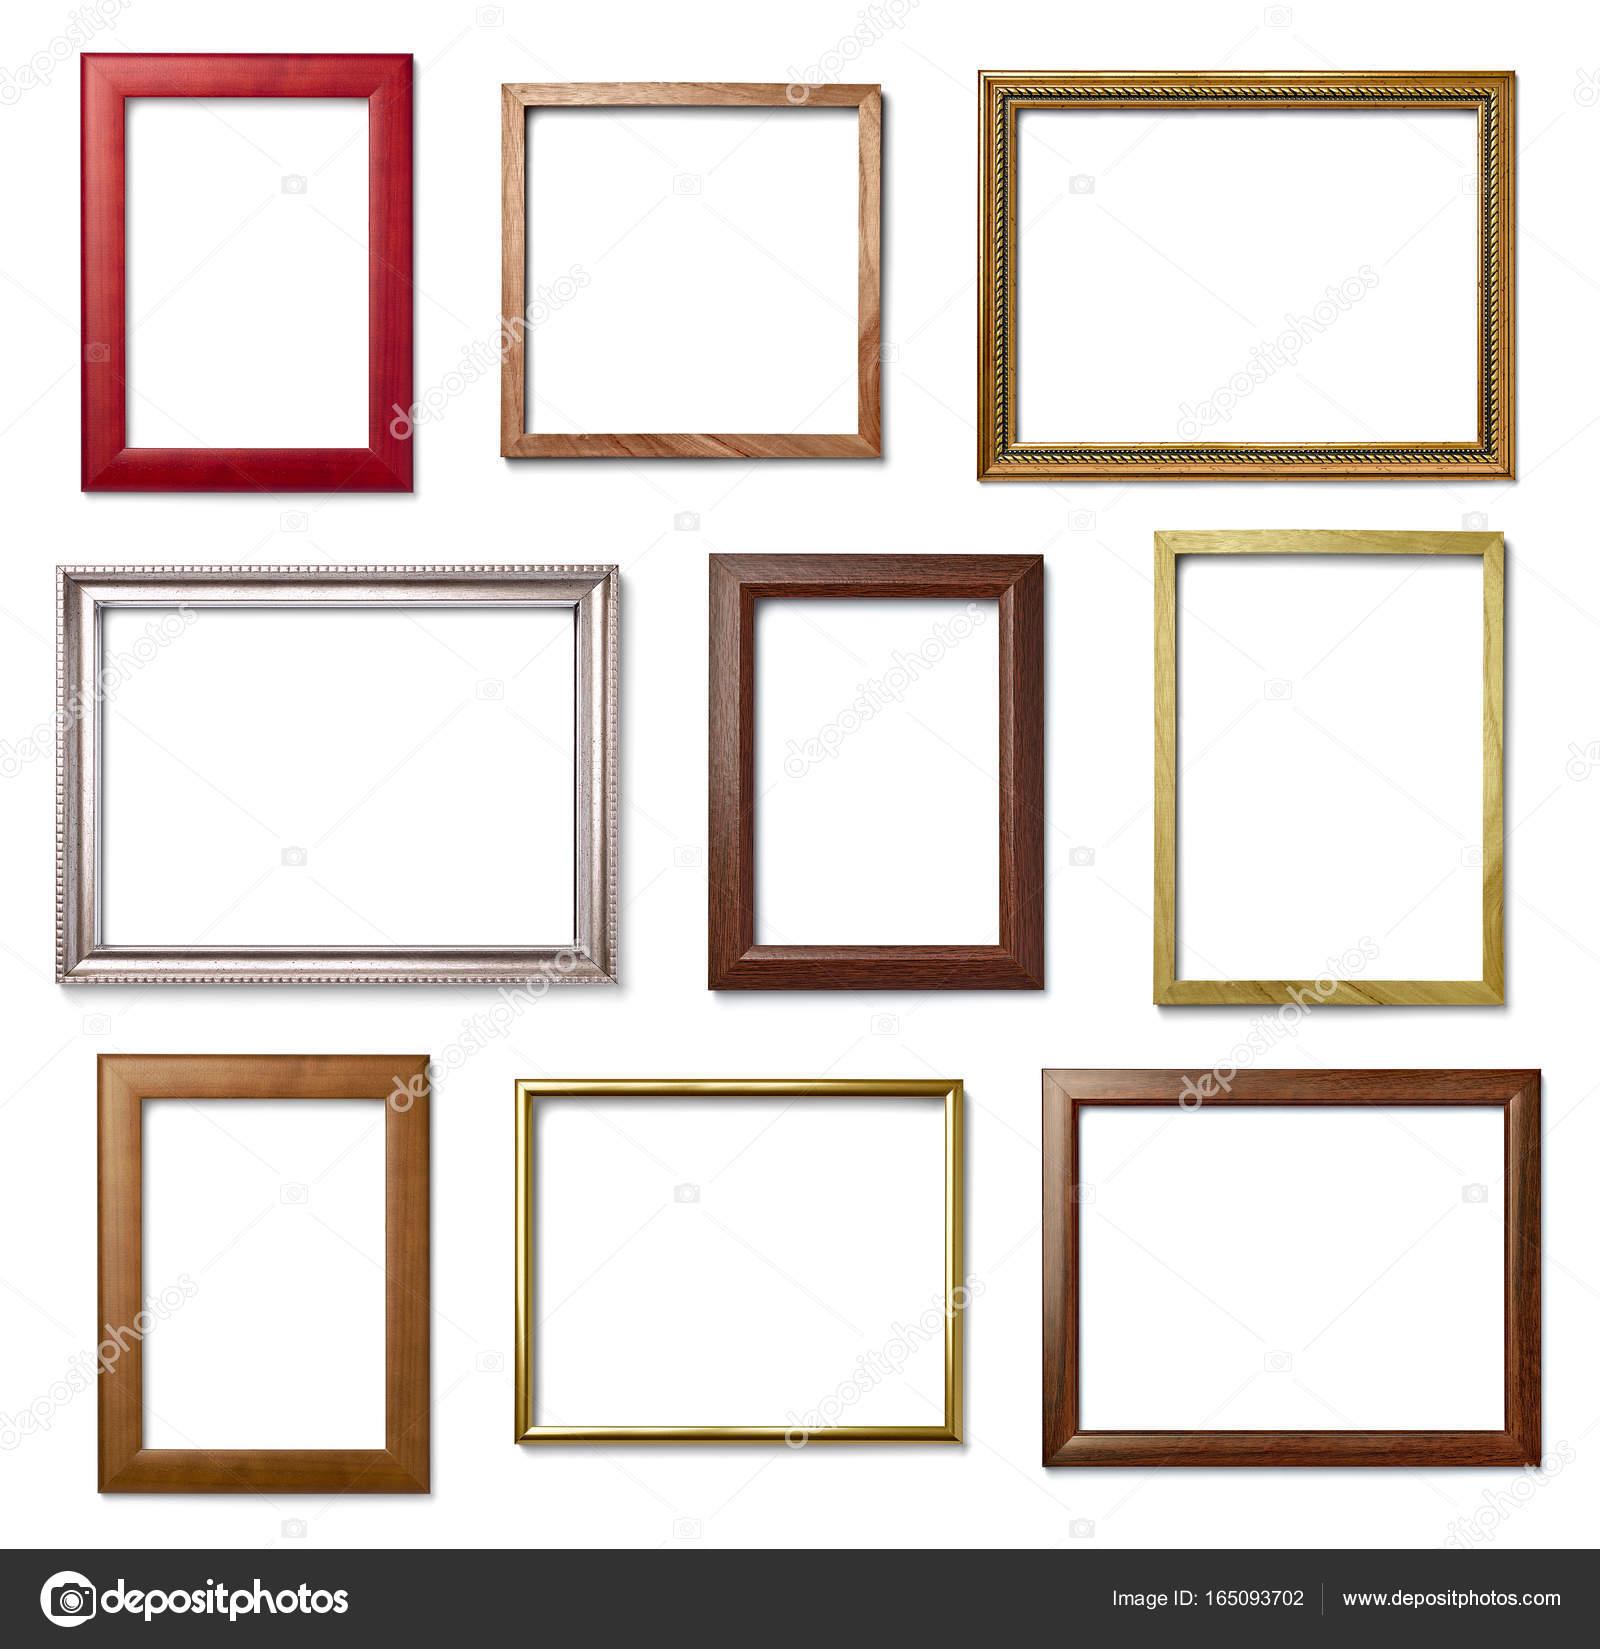 Vintage-Rahmen Holz Hintergrundbild — Stockfoto © PicsFive #165093702